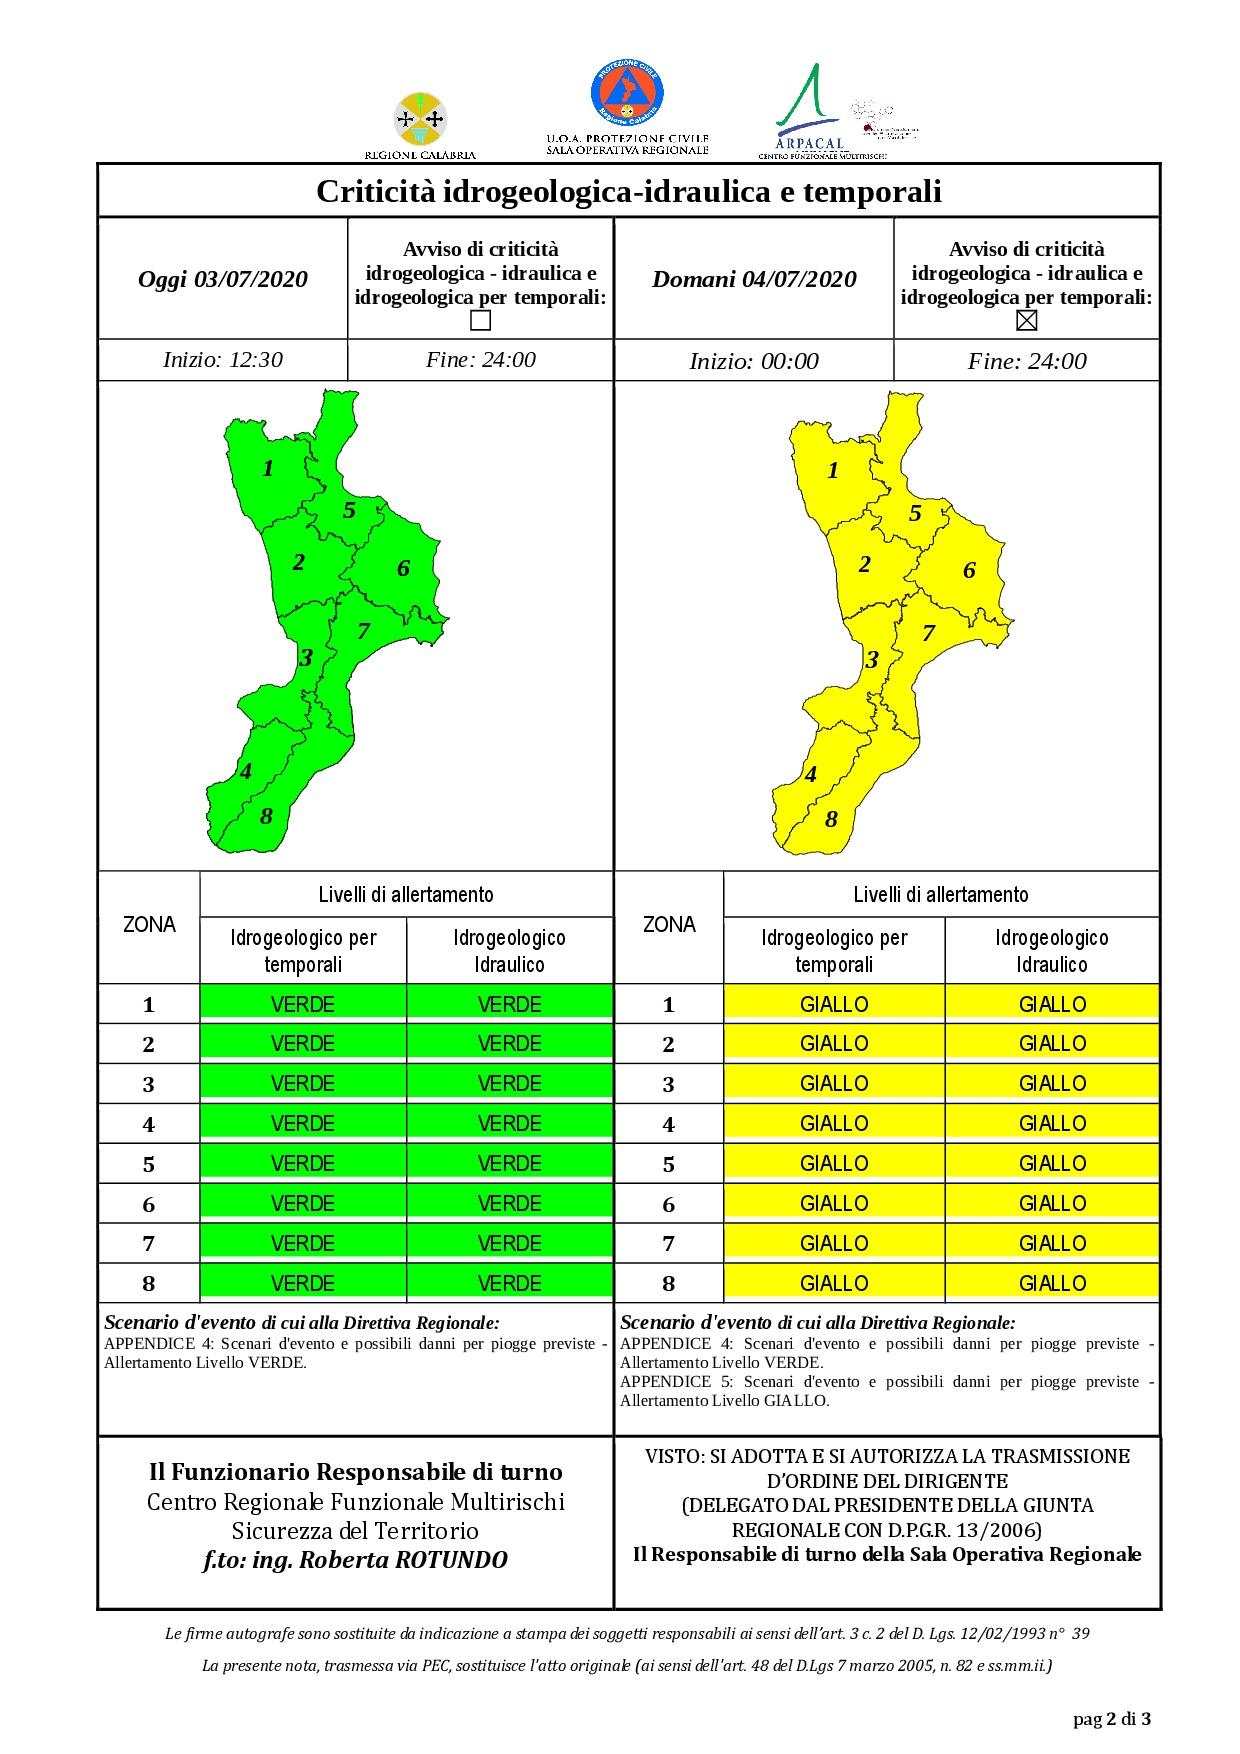 Criticità idrogeologica-idraulica e temporali in Calabria 03-07-2020